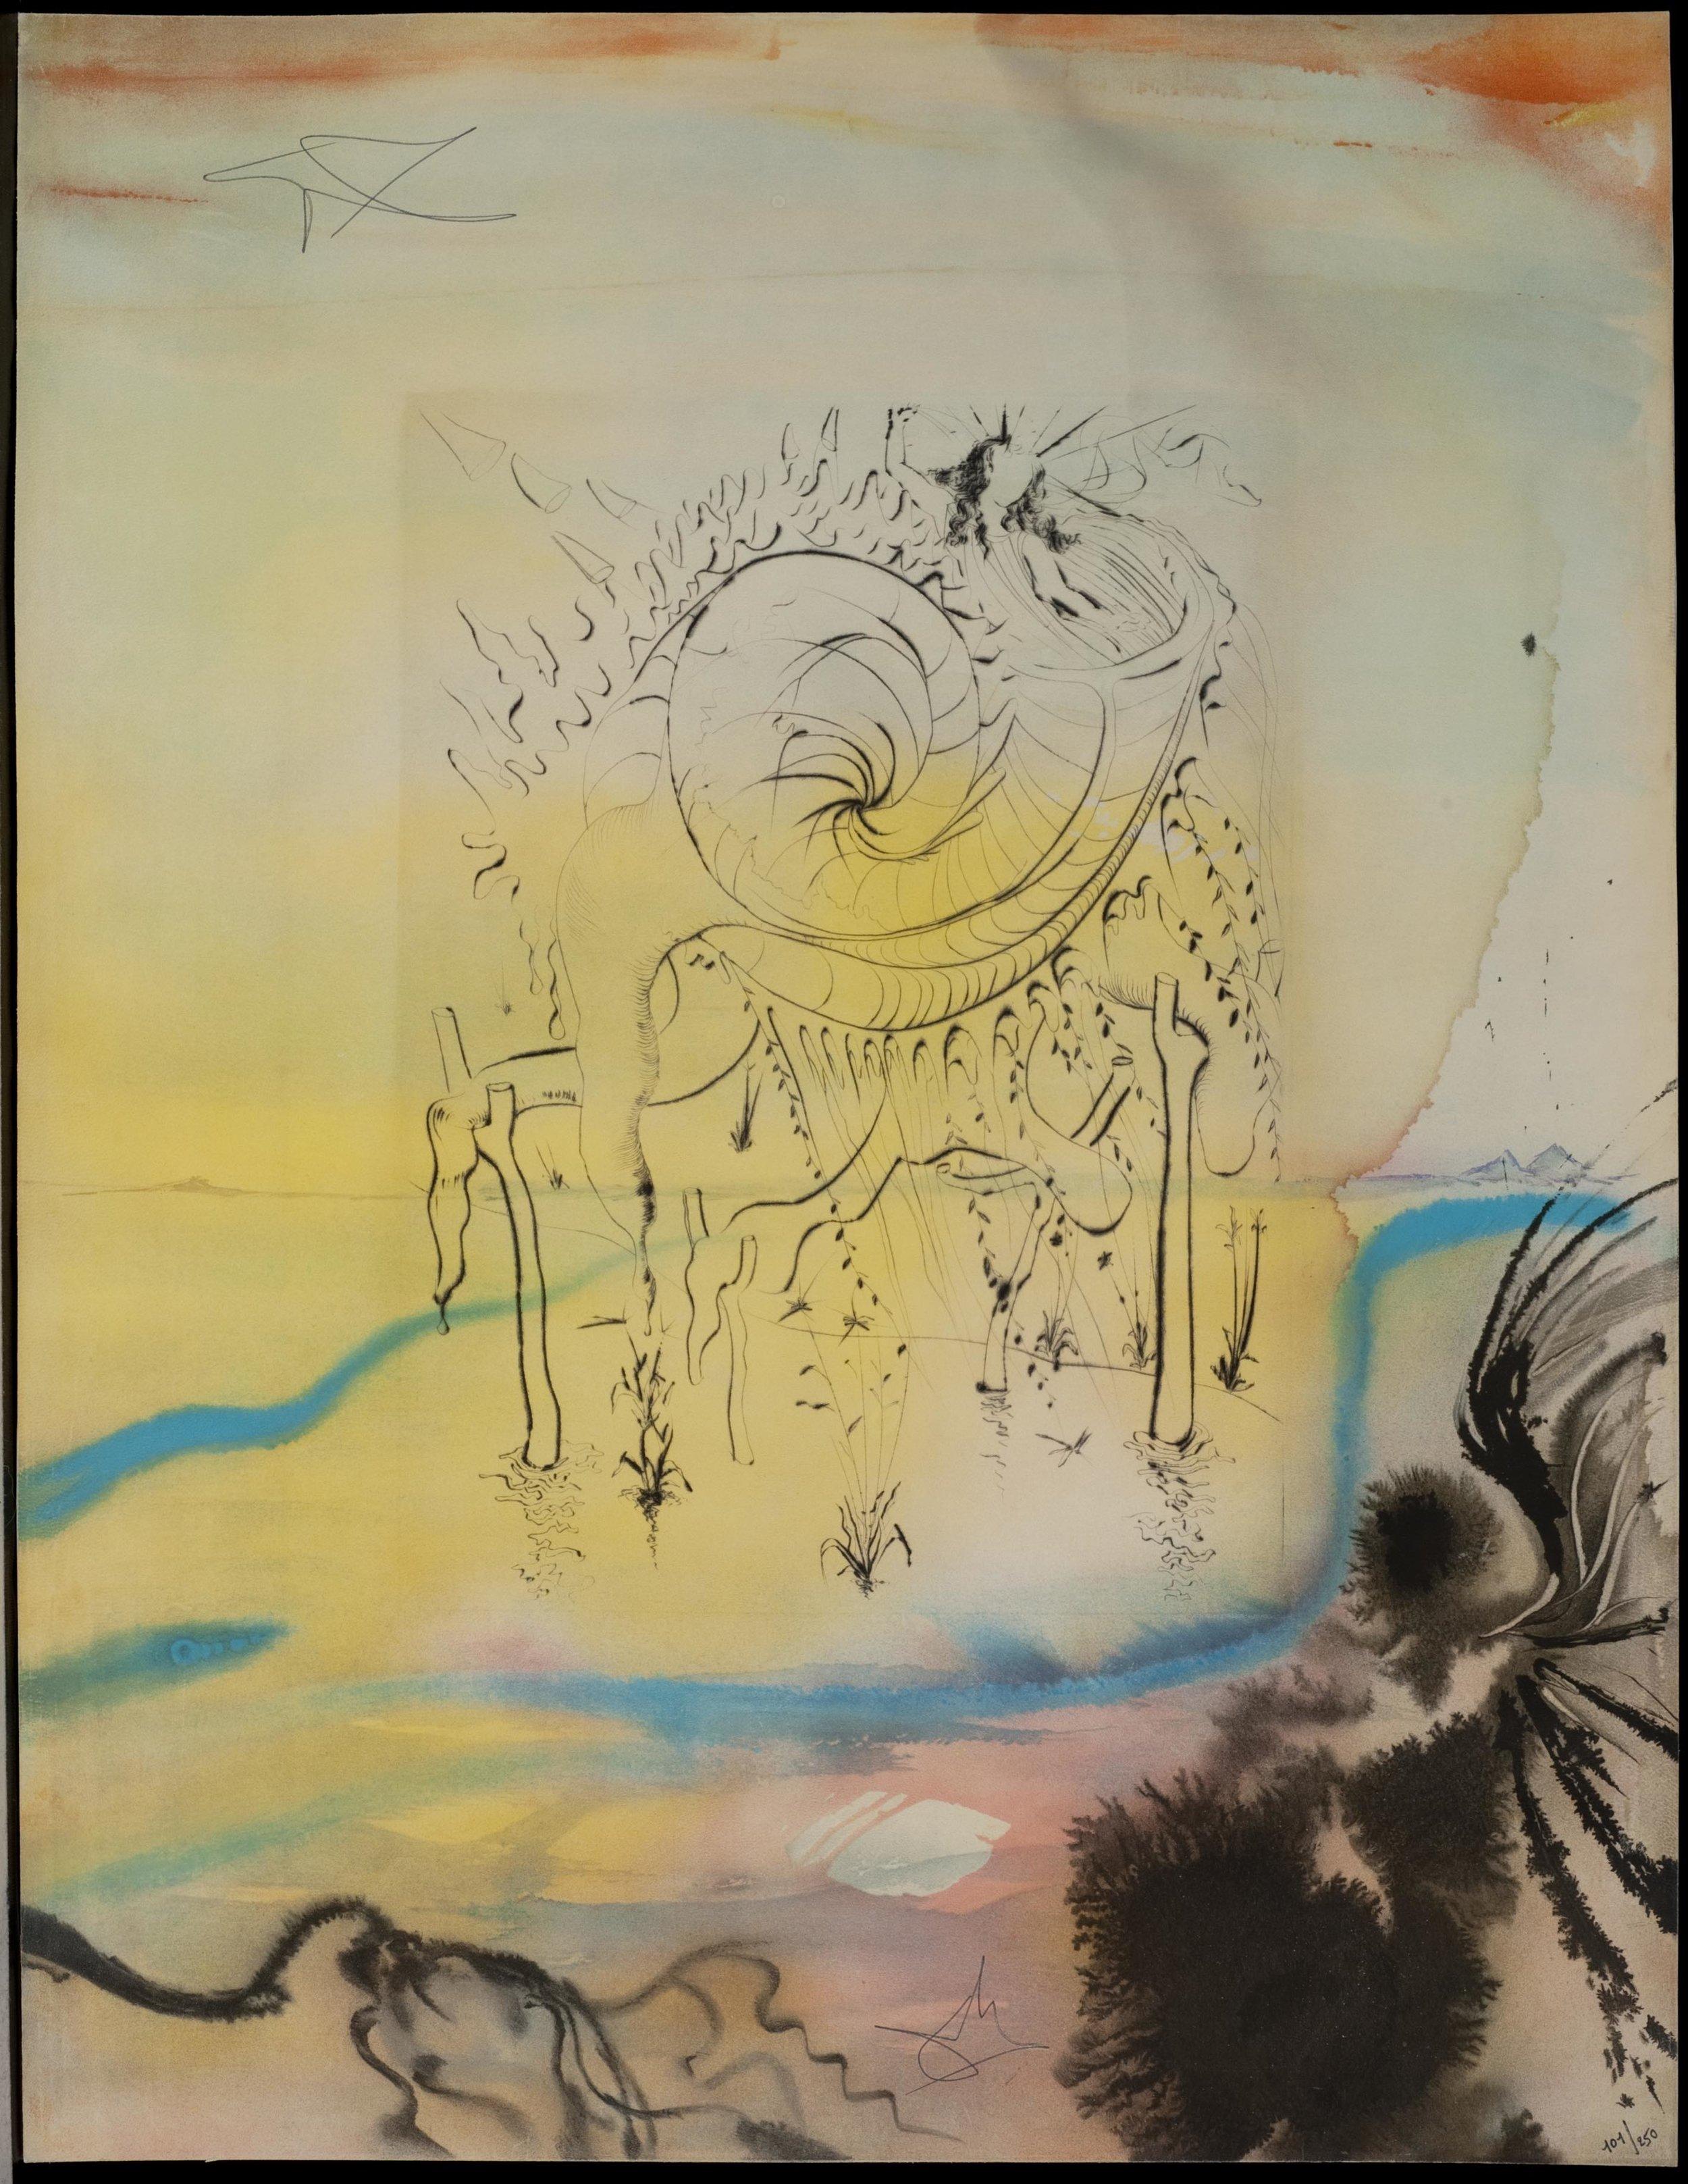 Moise sauvé des eaux , 1975 Lithograph on soft glove sheepskin 25 50/127h x 19 87/127w in